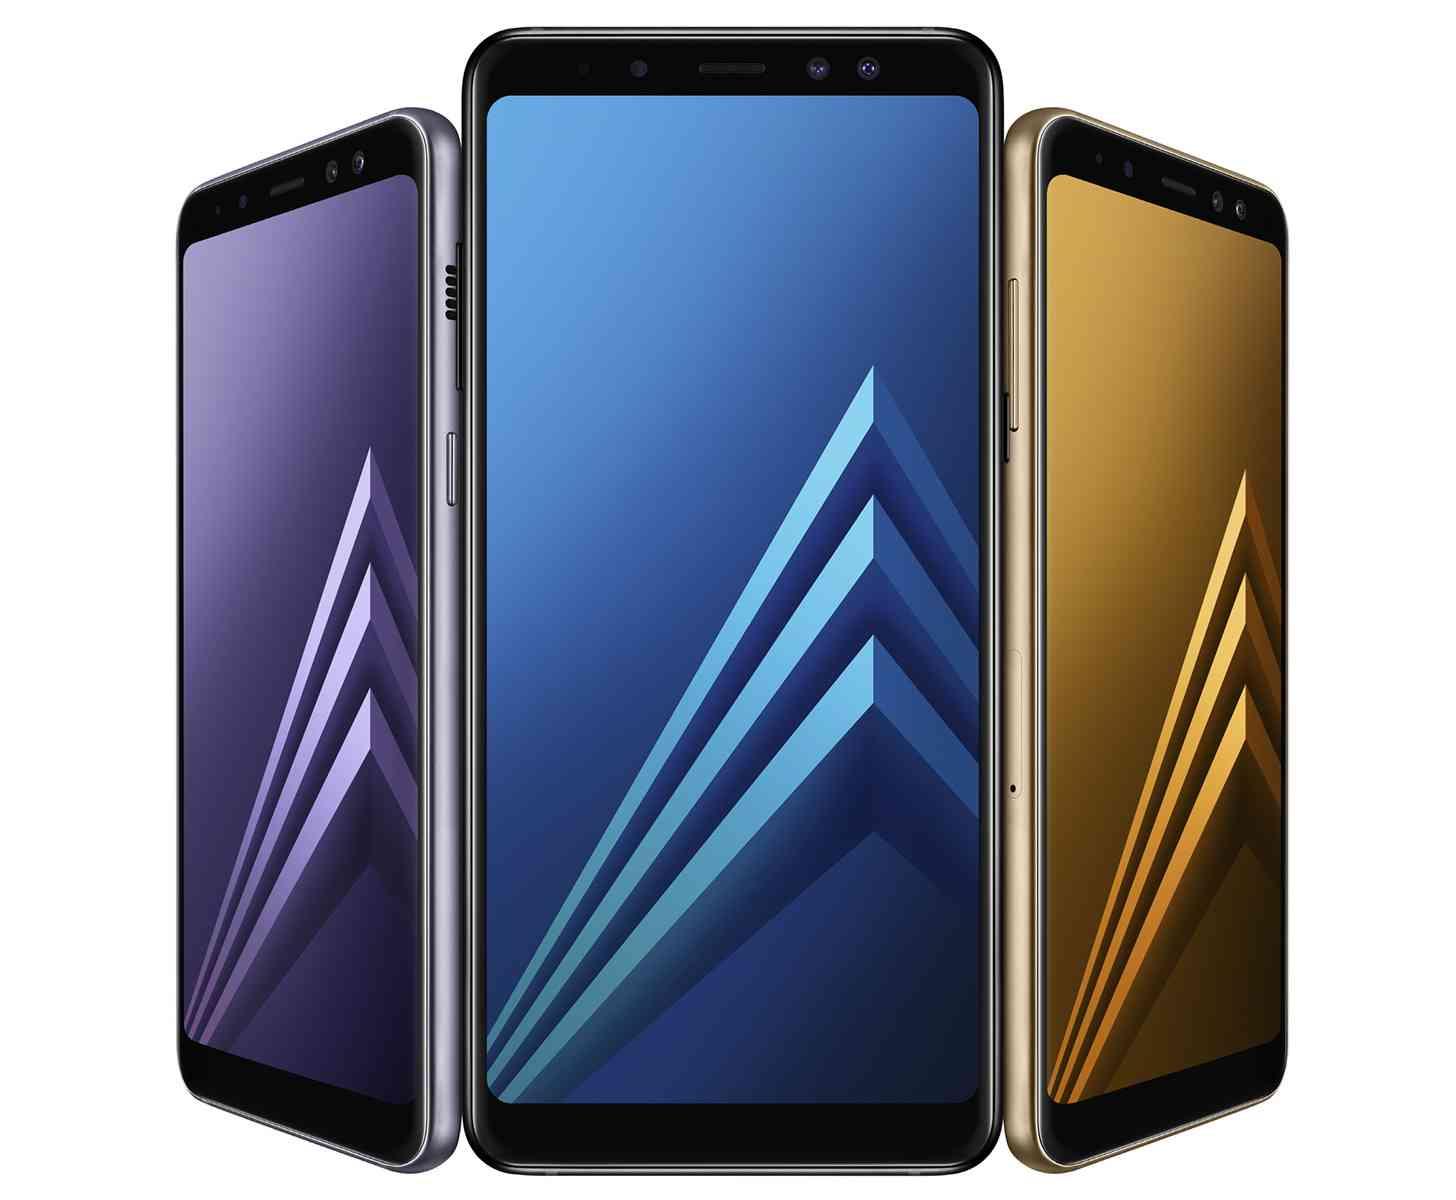 Samsung Galaxy A8 (2018), Galaxy A8+ (2018) official